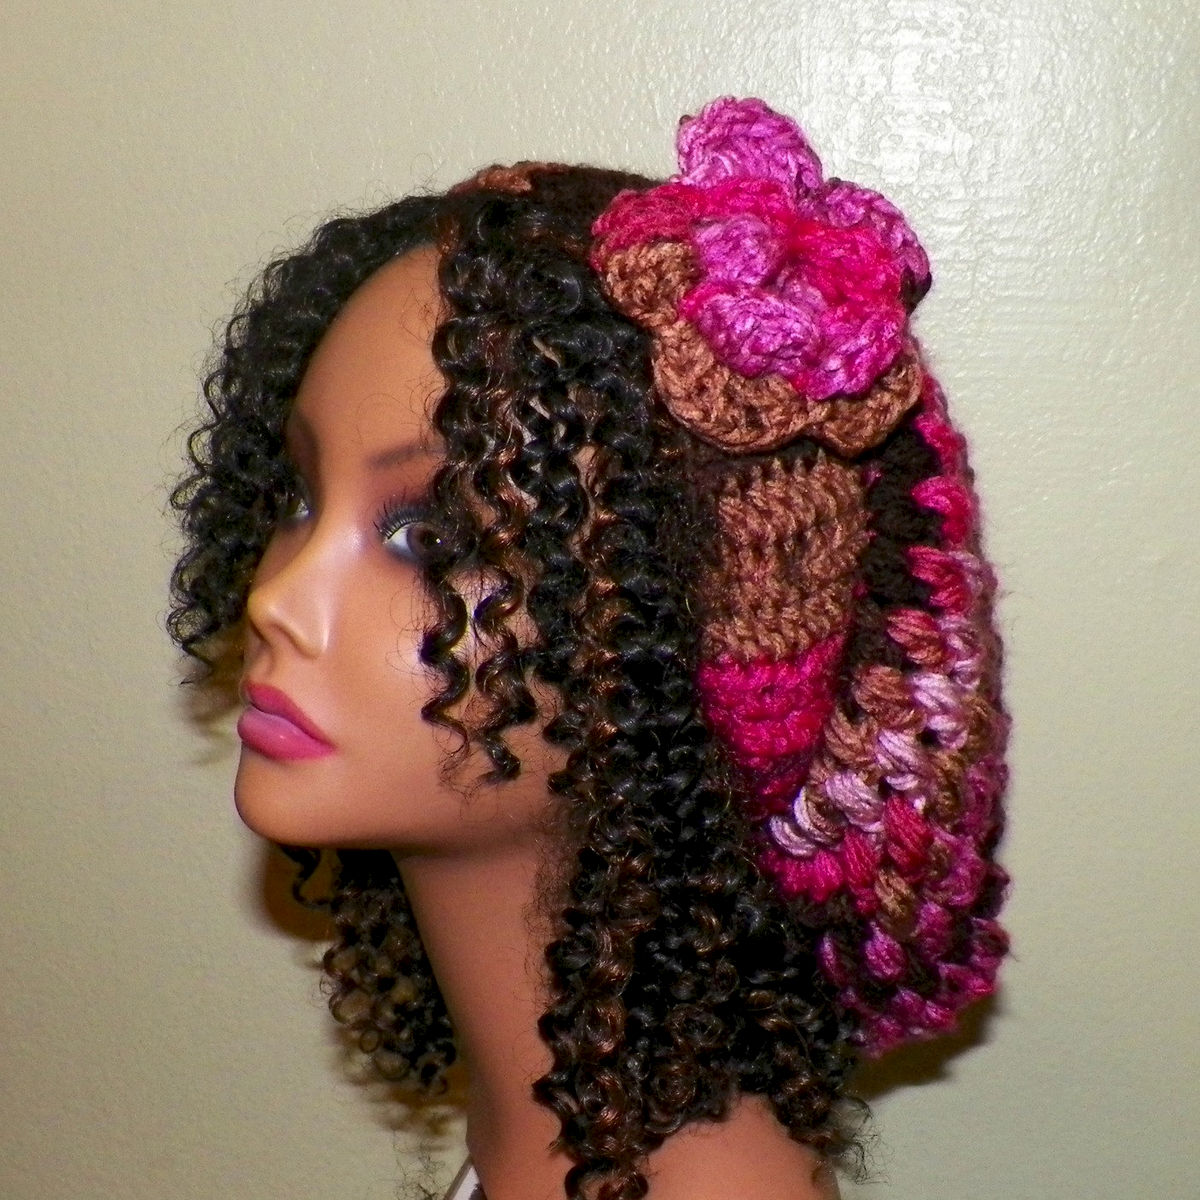 174afa1a0 Slouchy Hat Chunky Winter Womens Crochet Hippie Rainbow Pink Black Tam  Beret Boho Summer Beanie